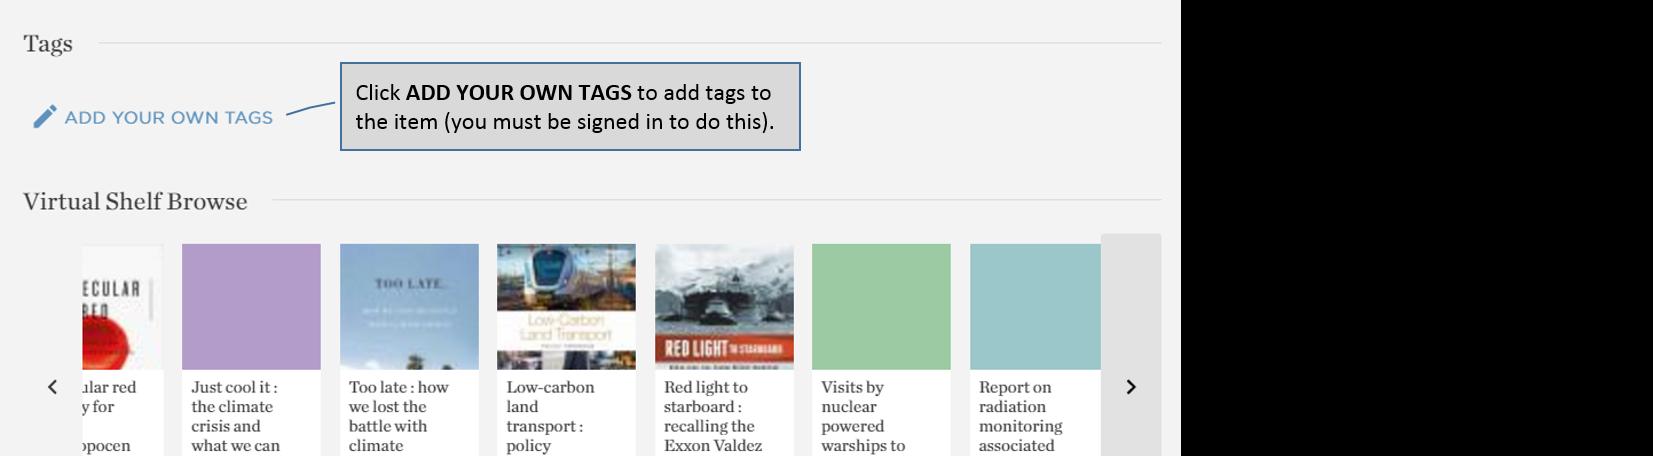 Catalogue – adding User Tags